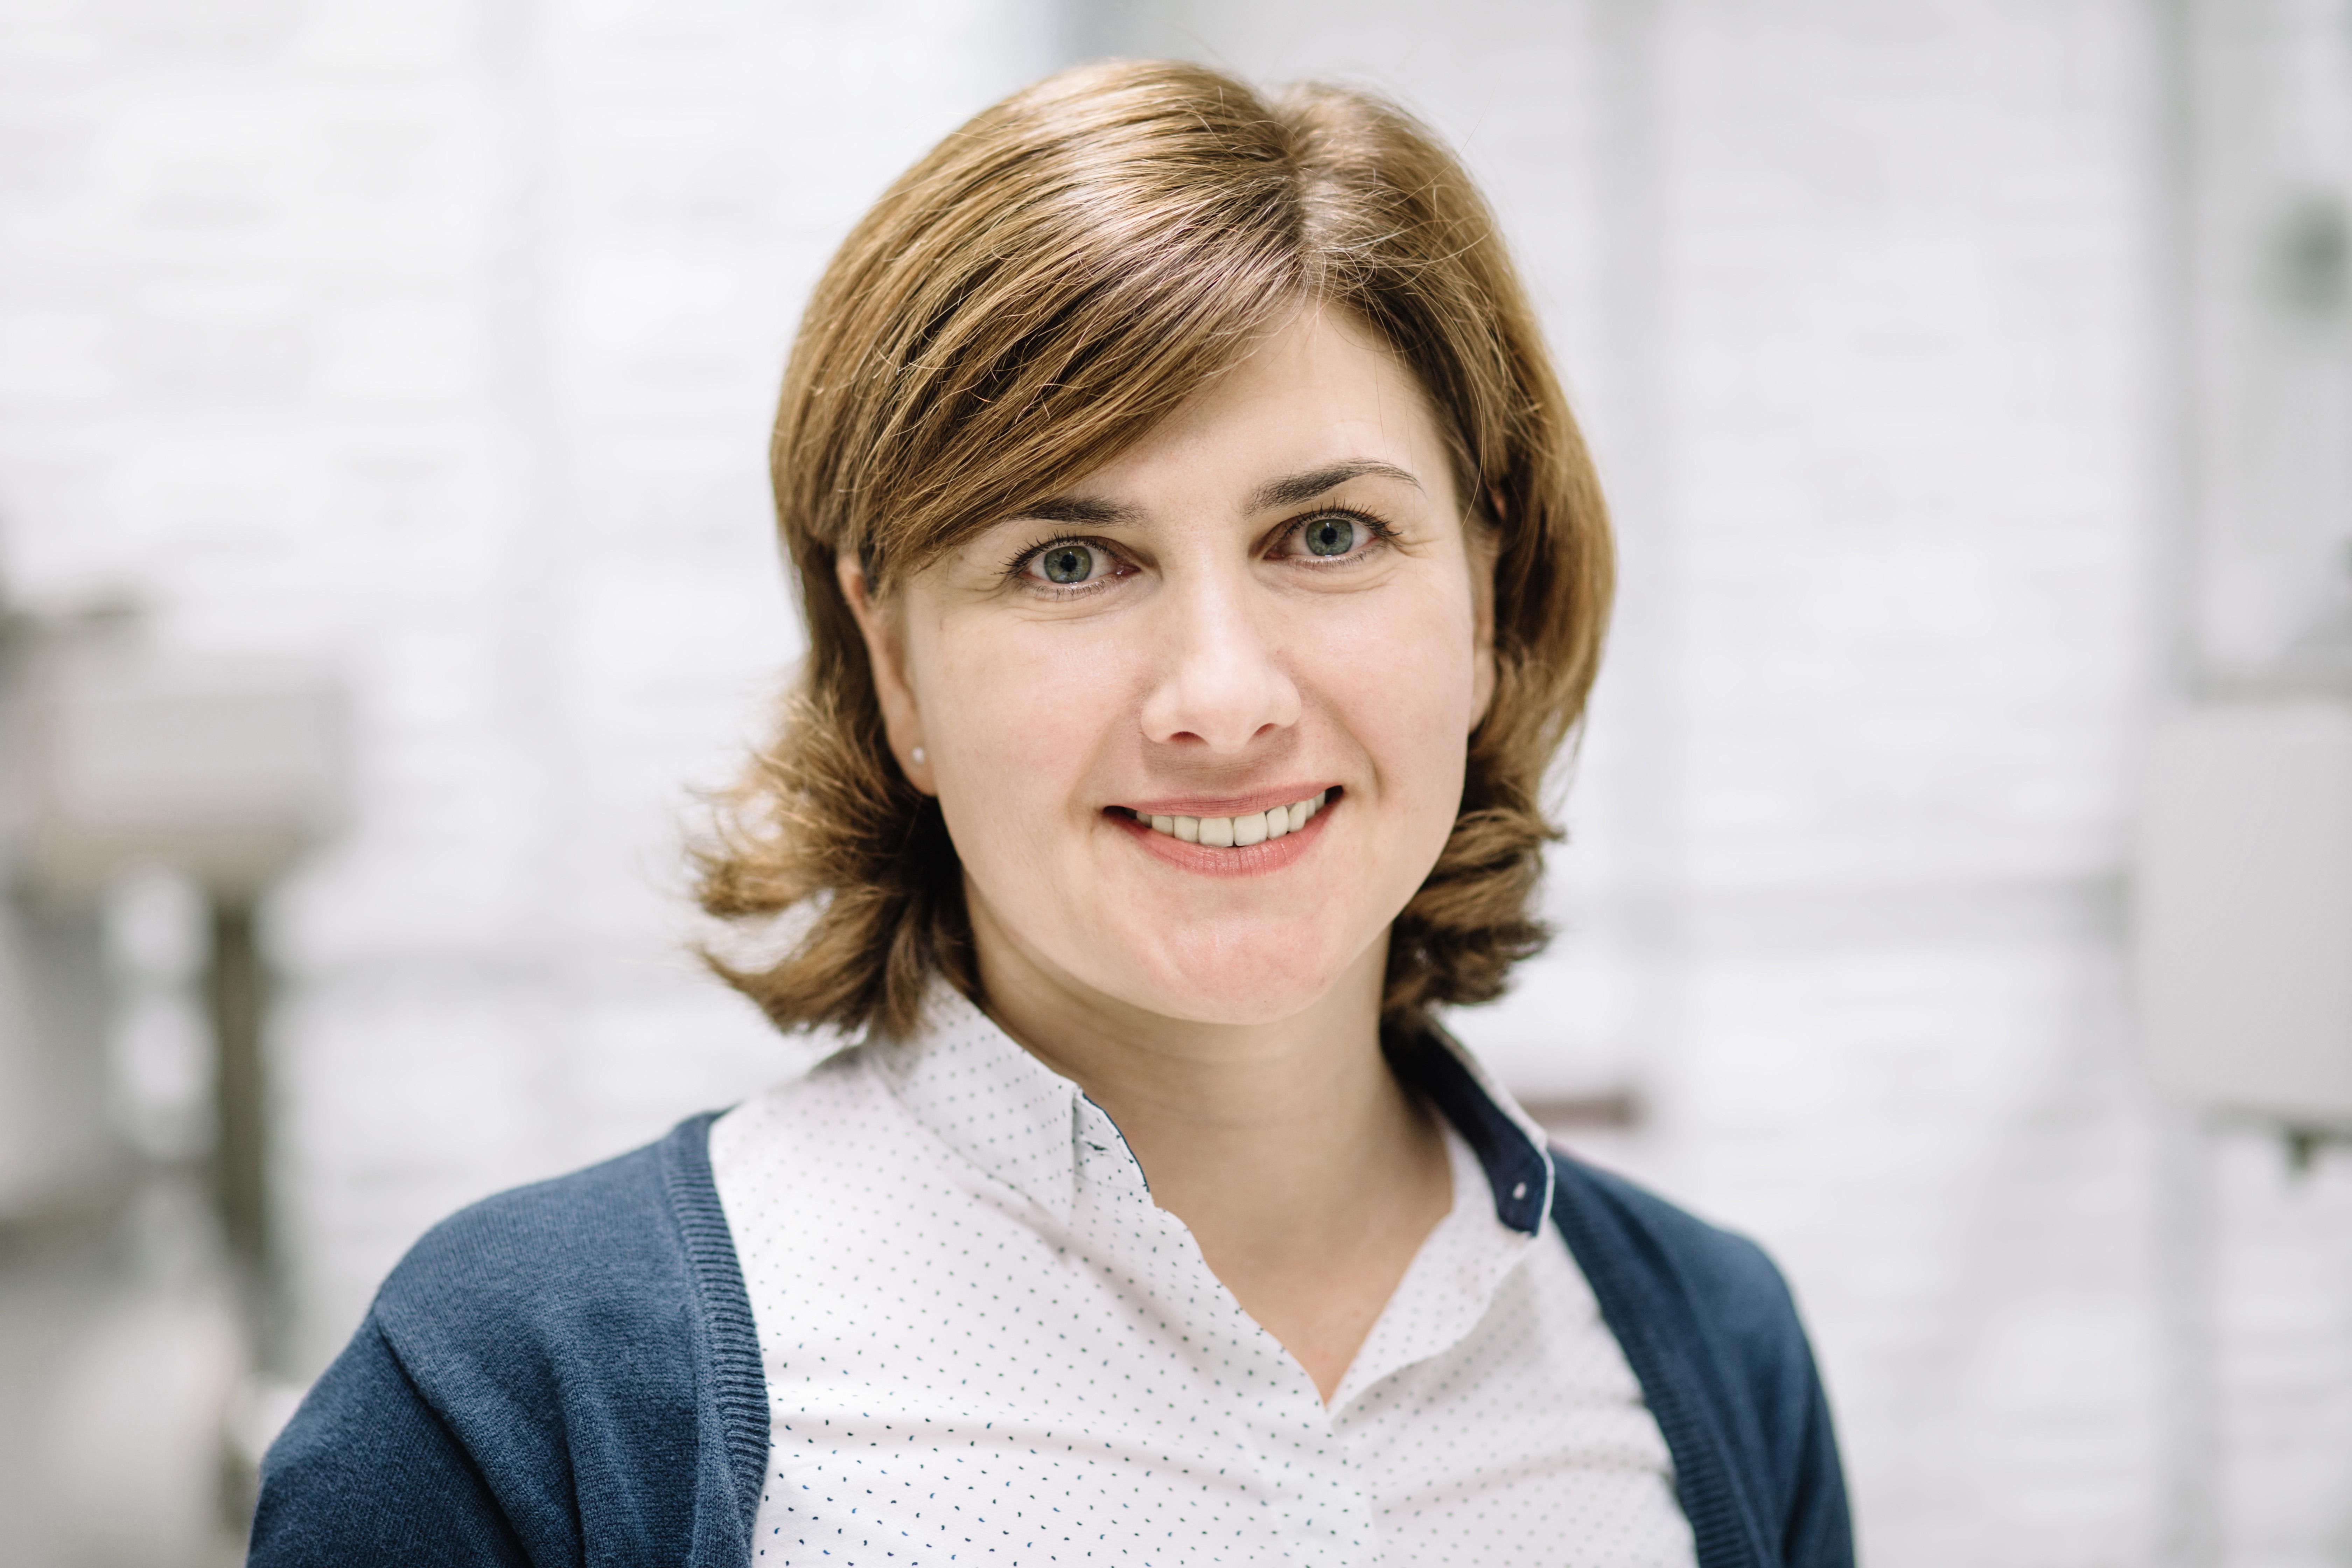 Cristina Avramut, MSc